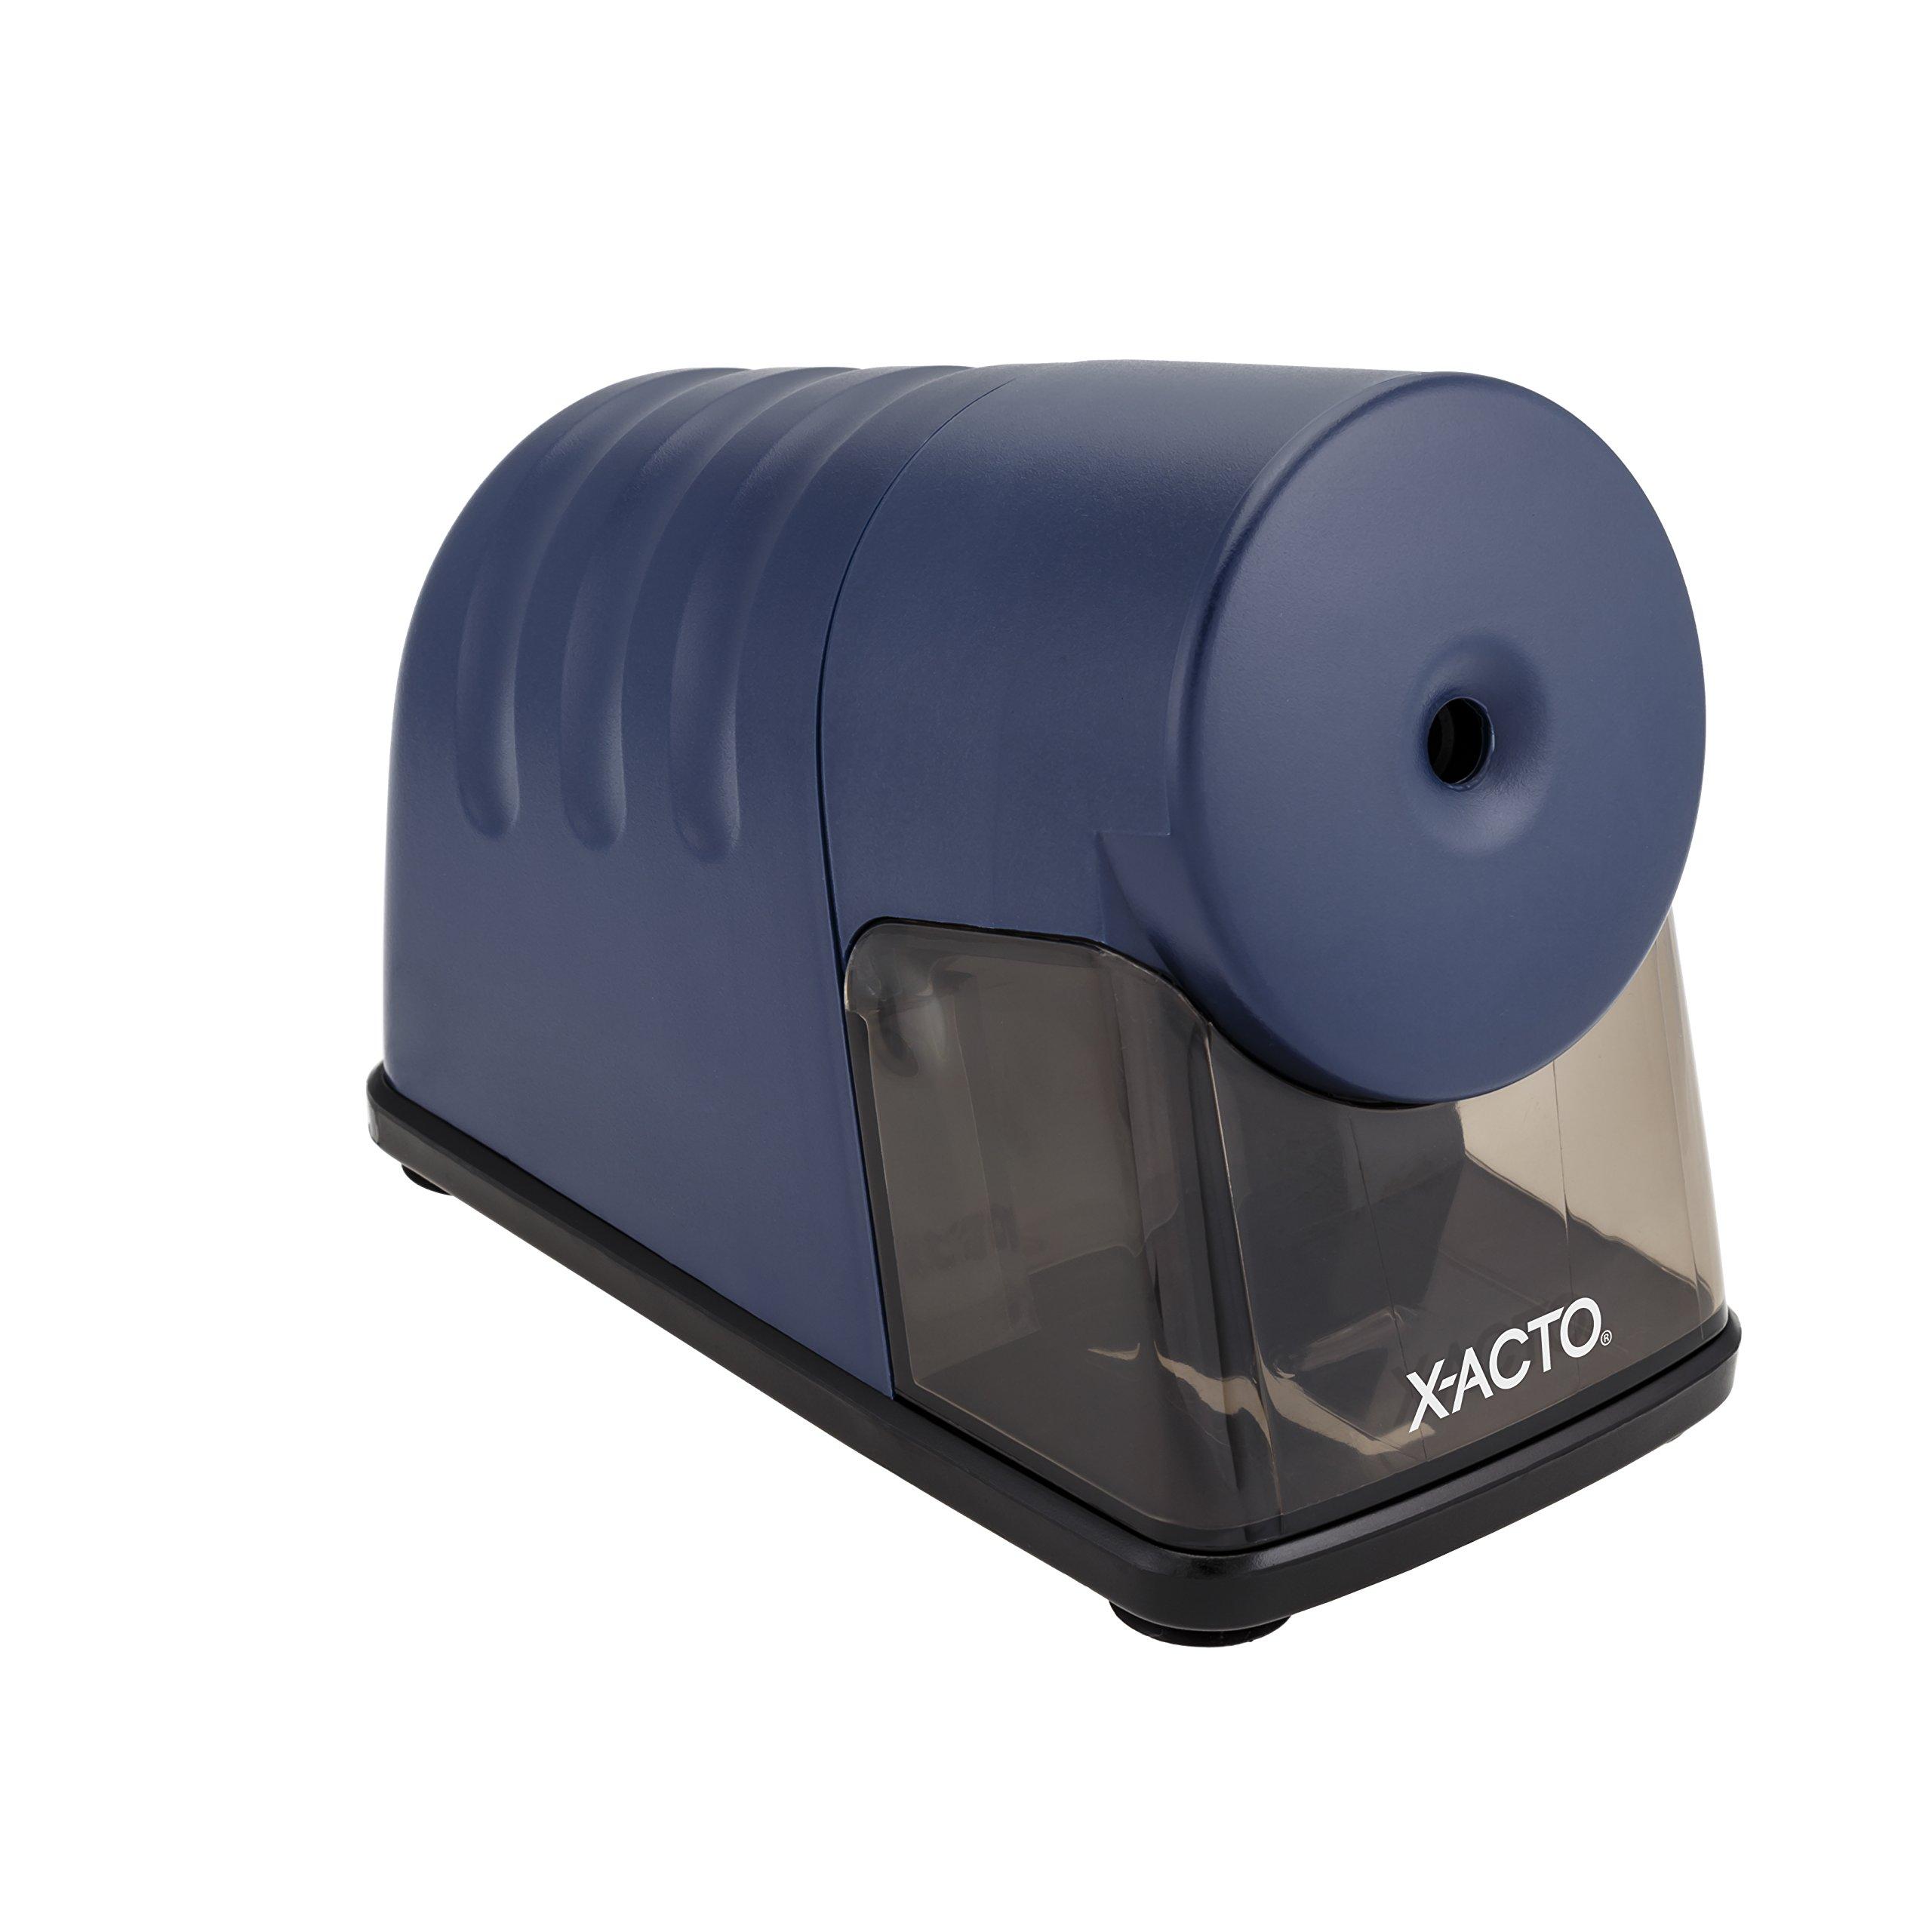 X-ACTO Powerhouse Electric Pencil Sharpener, Navy Blue